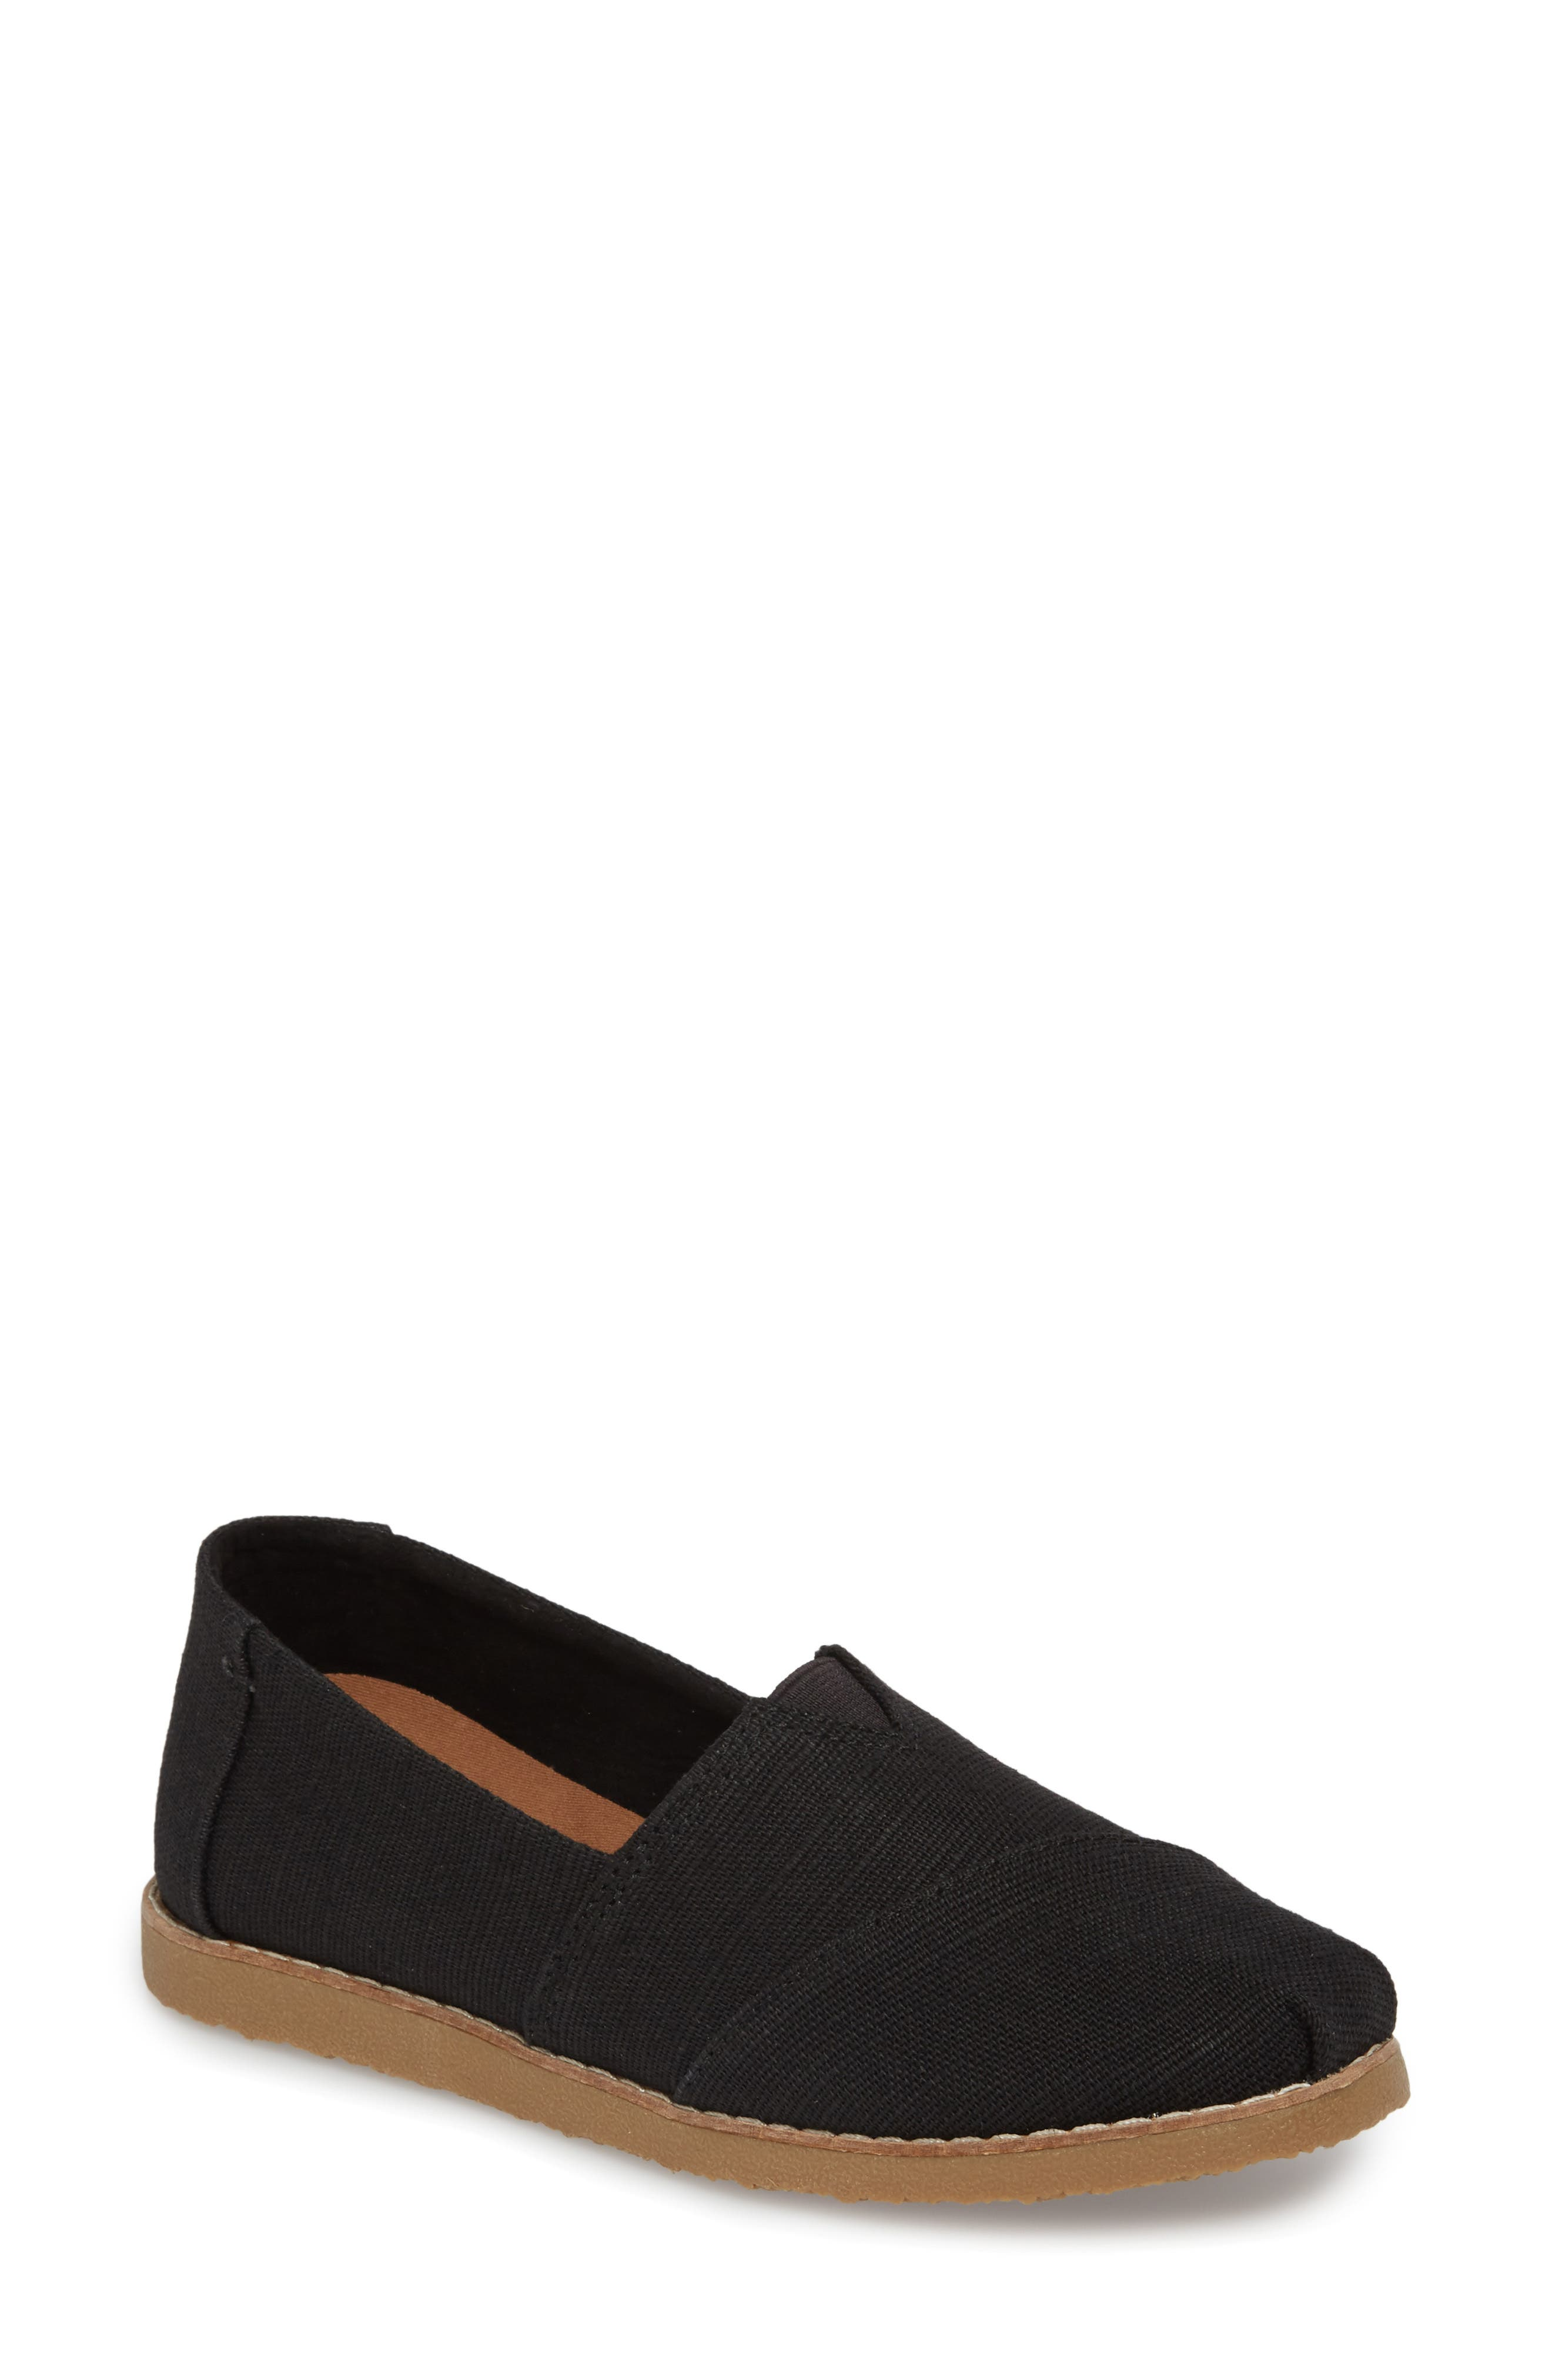 Alpargata Slip-On,                         Main,                         color, BLACK HERITAGE CANVAS